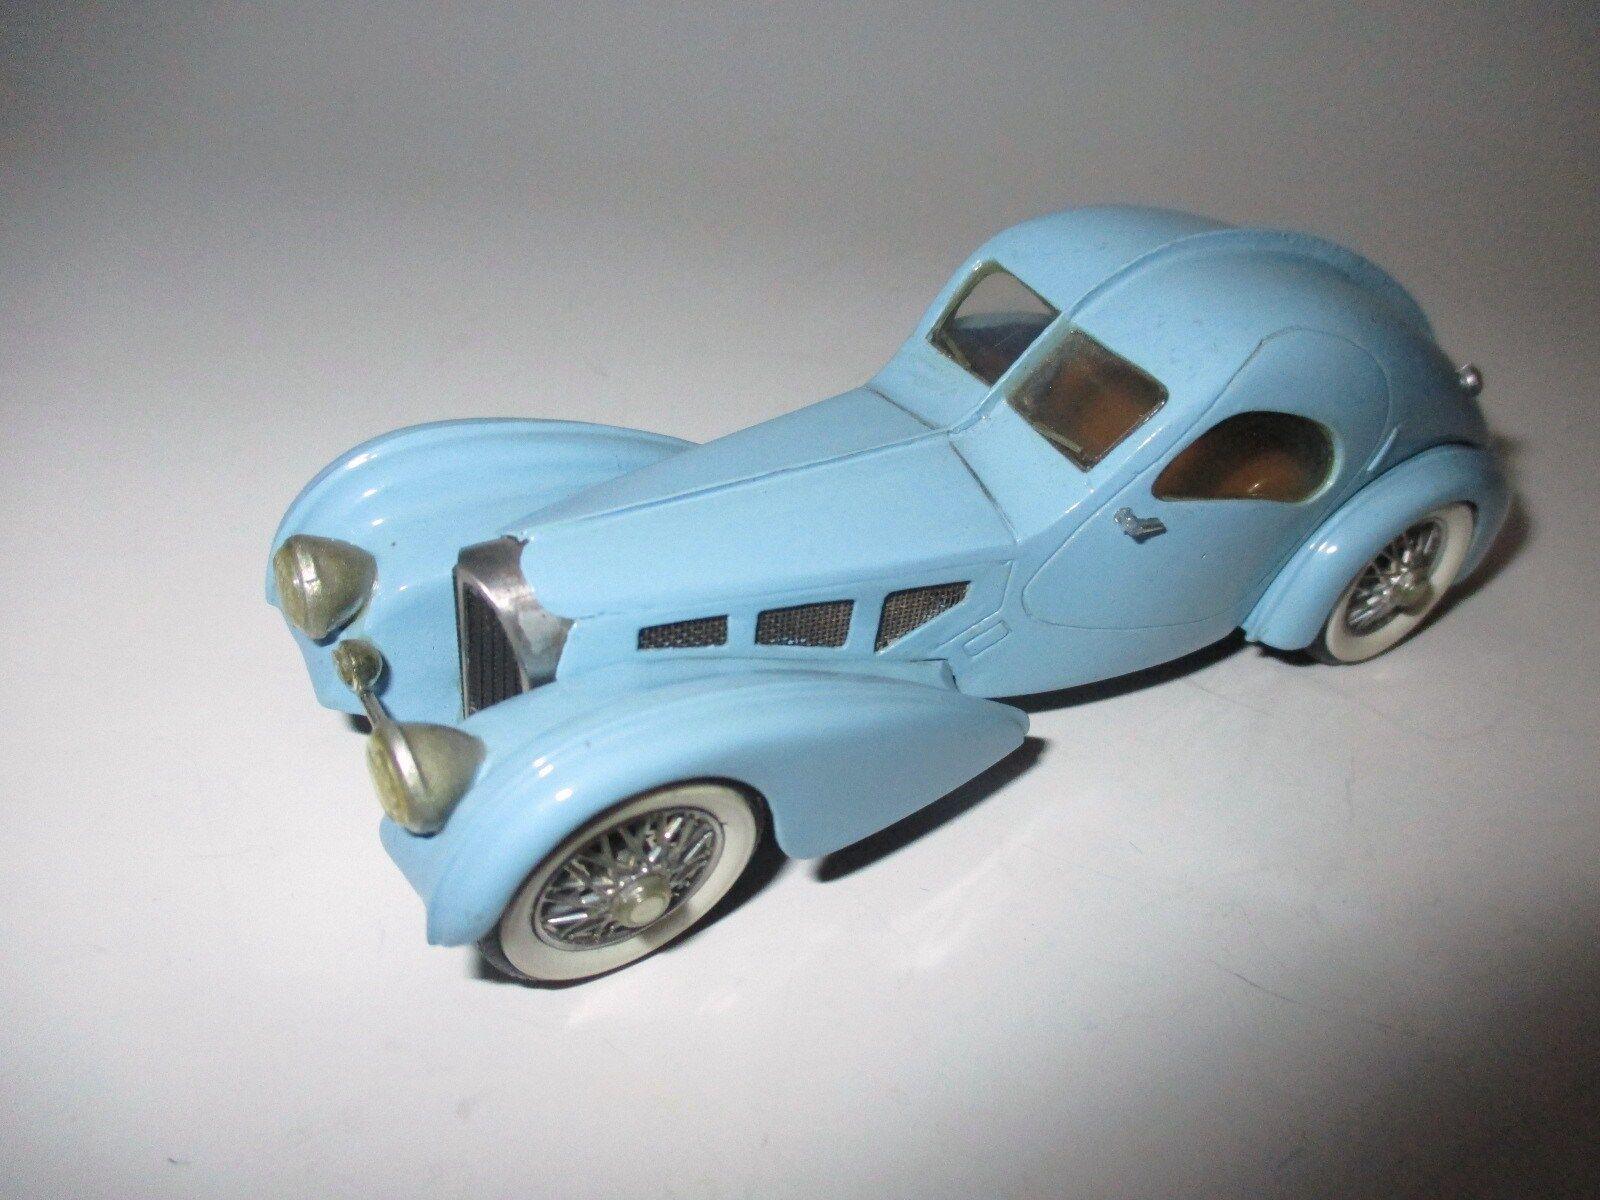 Bugatti Type T 57 SC Atlantic, à la main handmade H G pêcheurs mmmm pièce unique 1 43